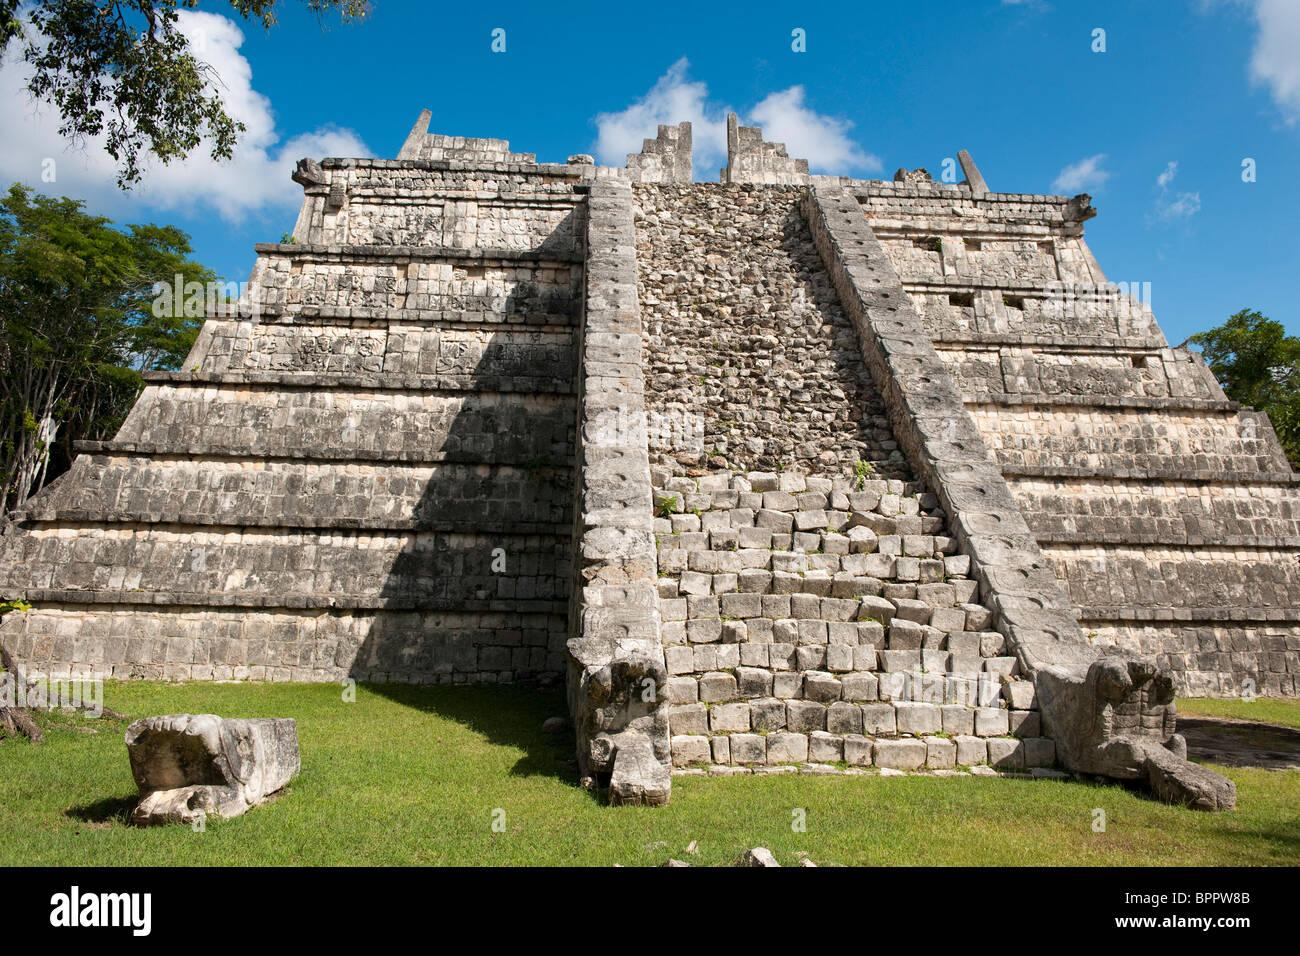 El Osario, Chichen Itza ruins, The Yucatan, Mexico - Stock Image